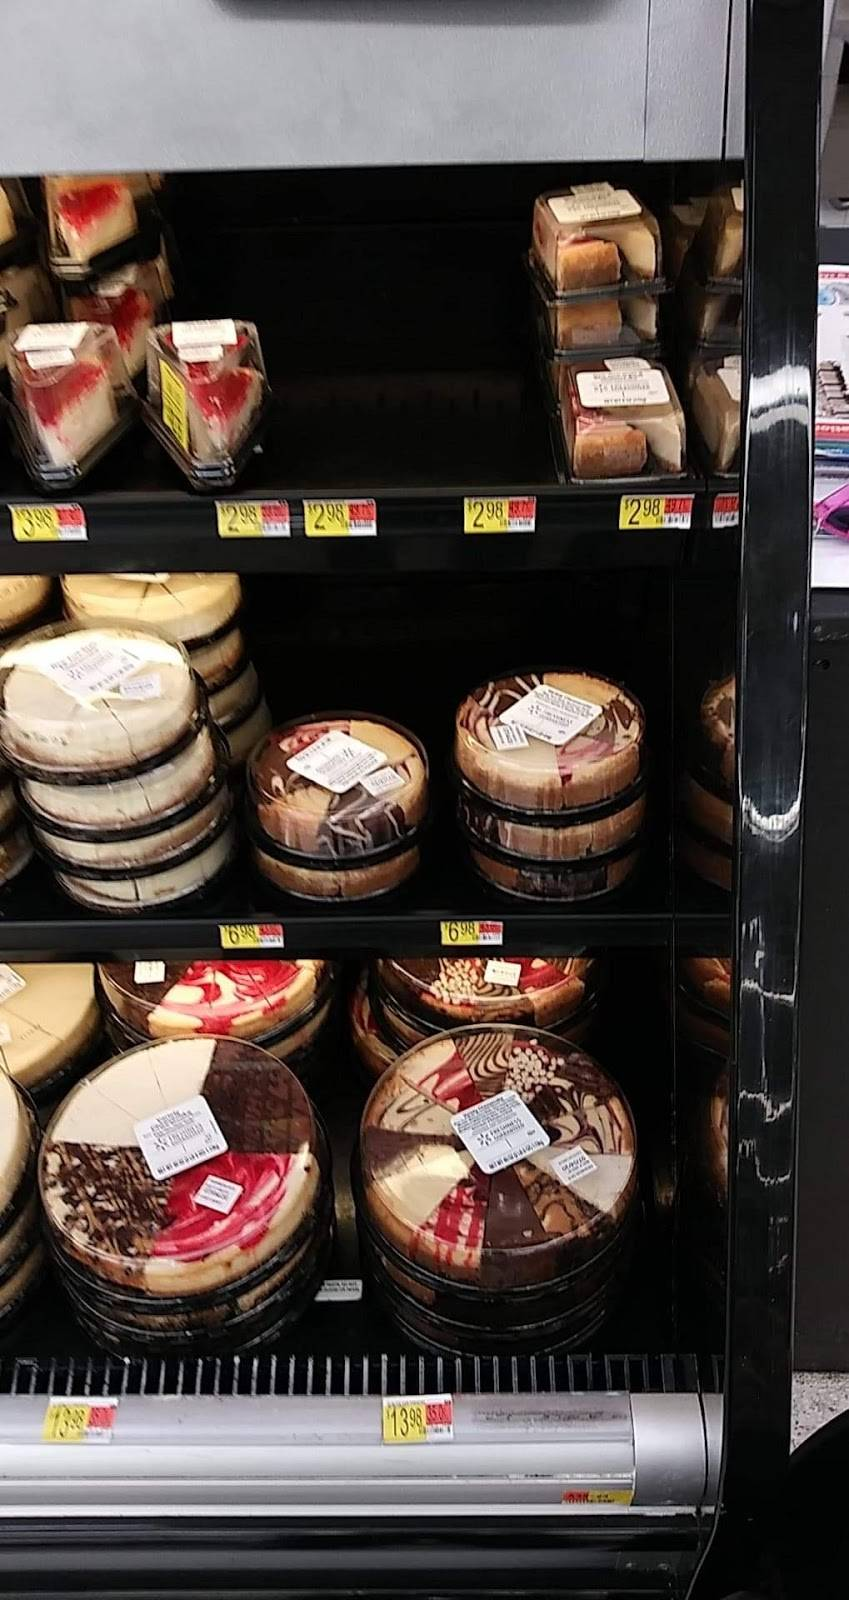 Walmart Supercenter - department store  | Photo 5 of 9 | Address: 207 S Memorial Dr, Tulsa, OK 74112, USA | Phone: (918) 834-8700